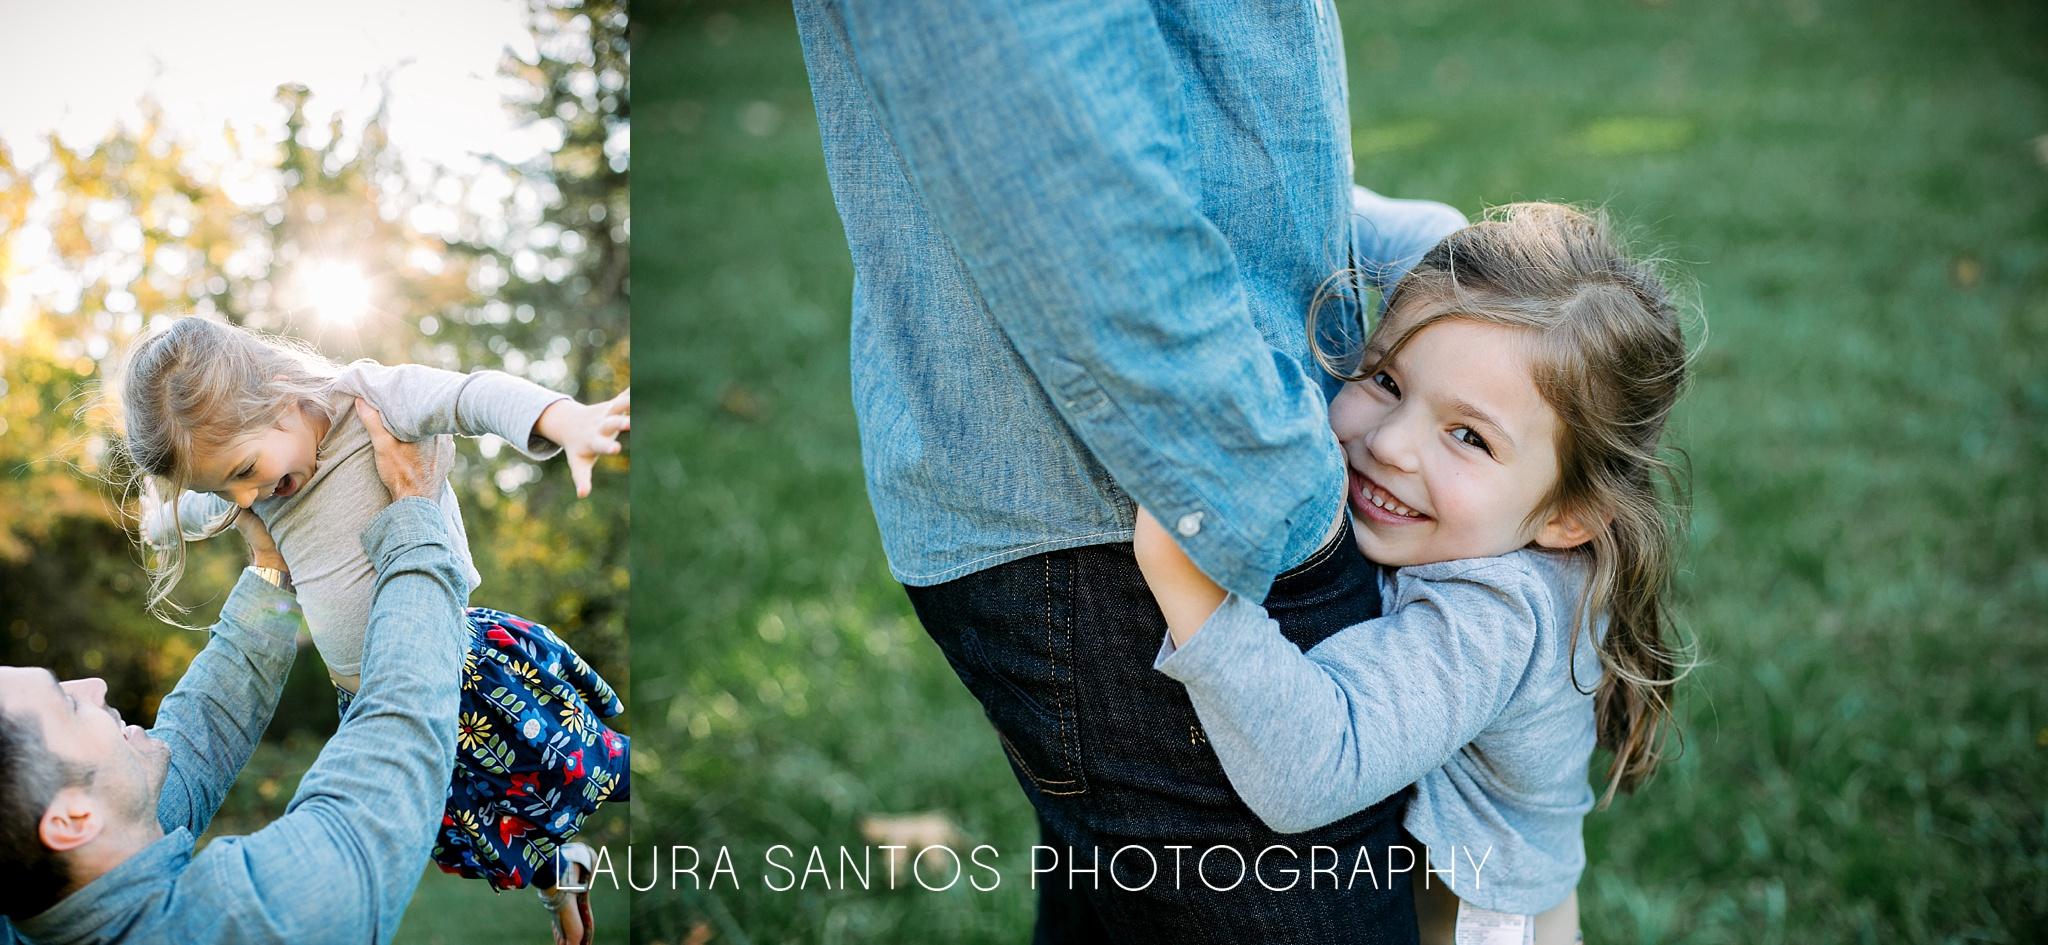 Laura Santos Photography Portland Oregon Family Photographer_0084.jpg